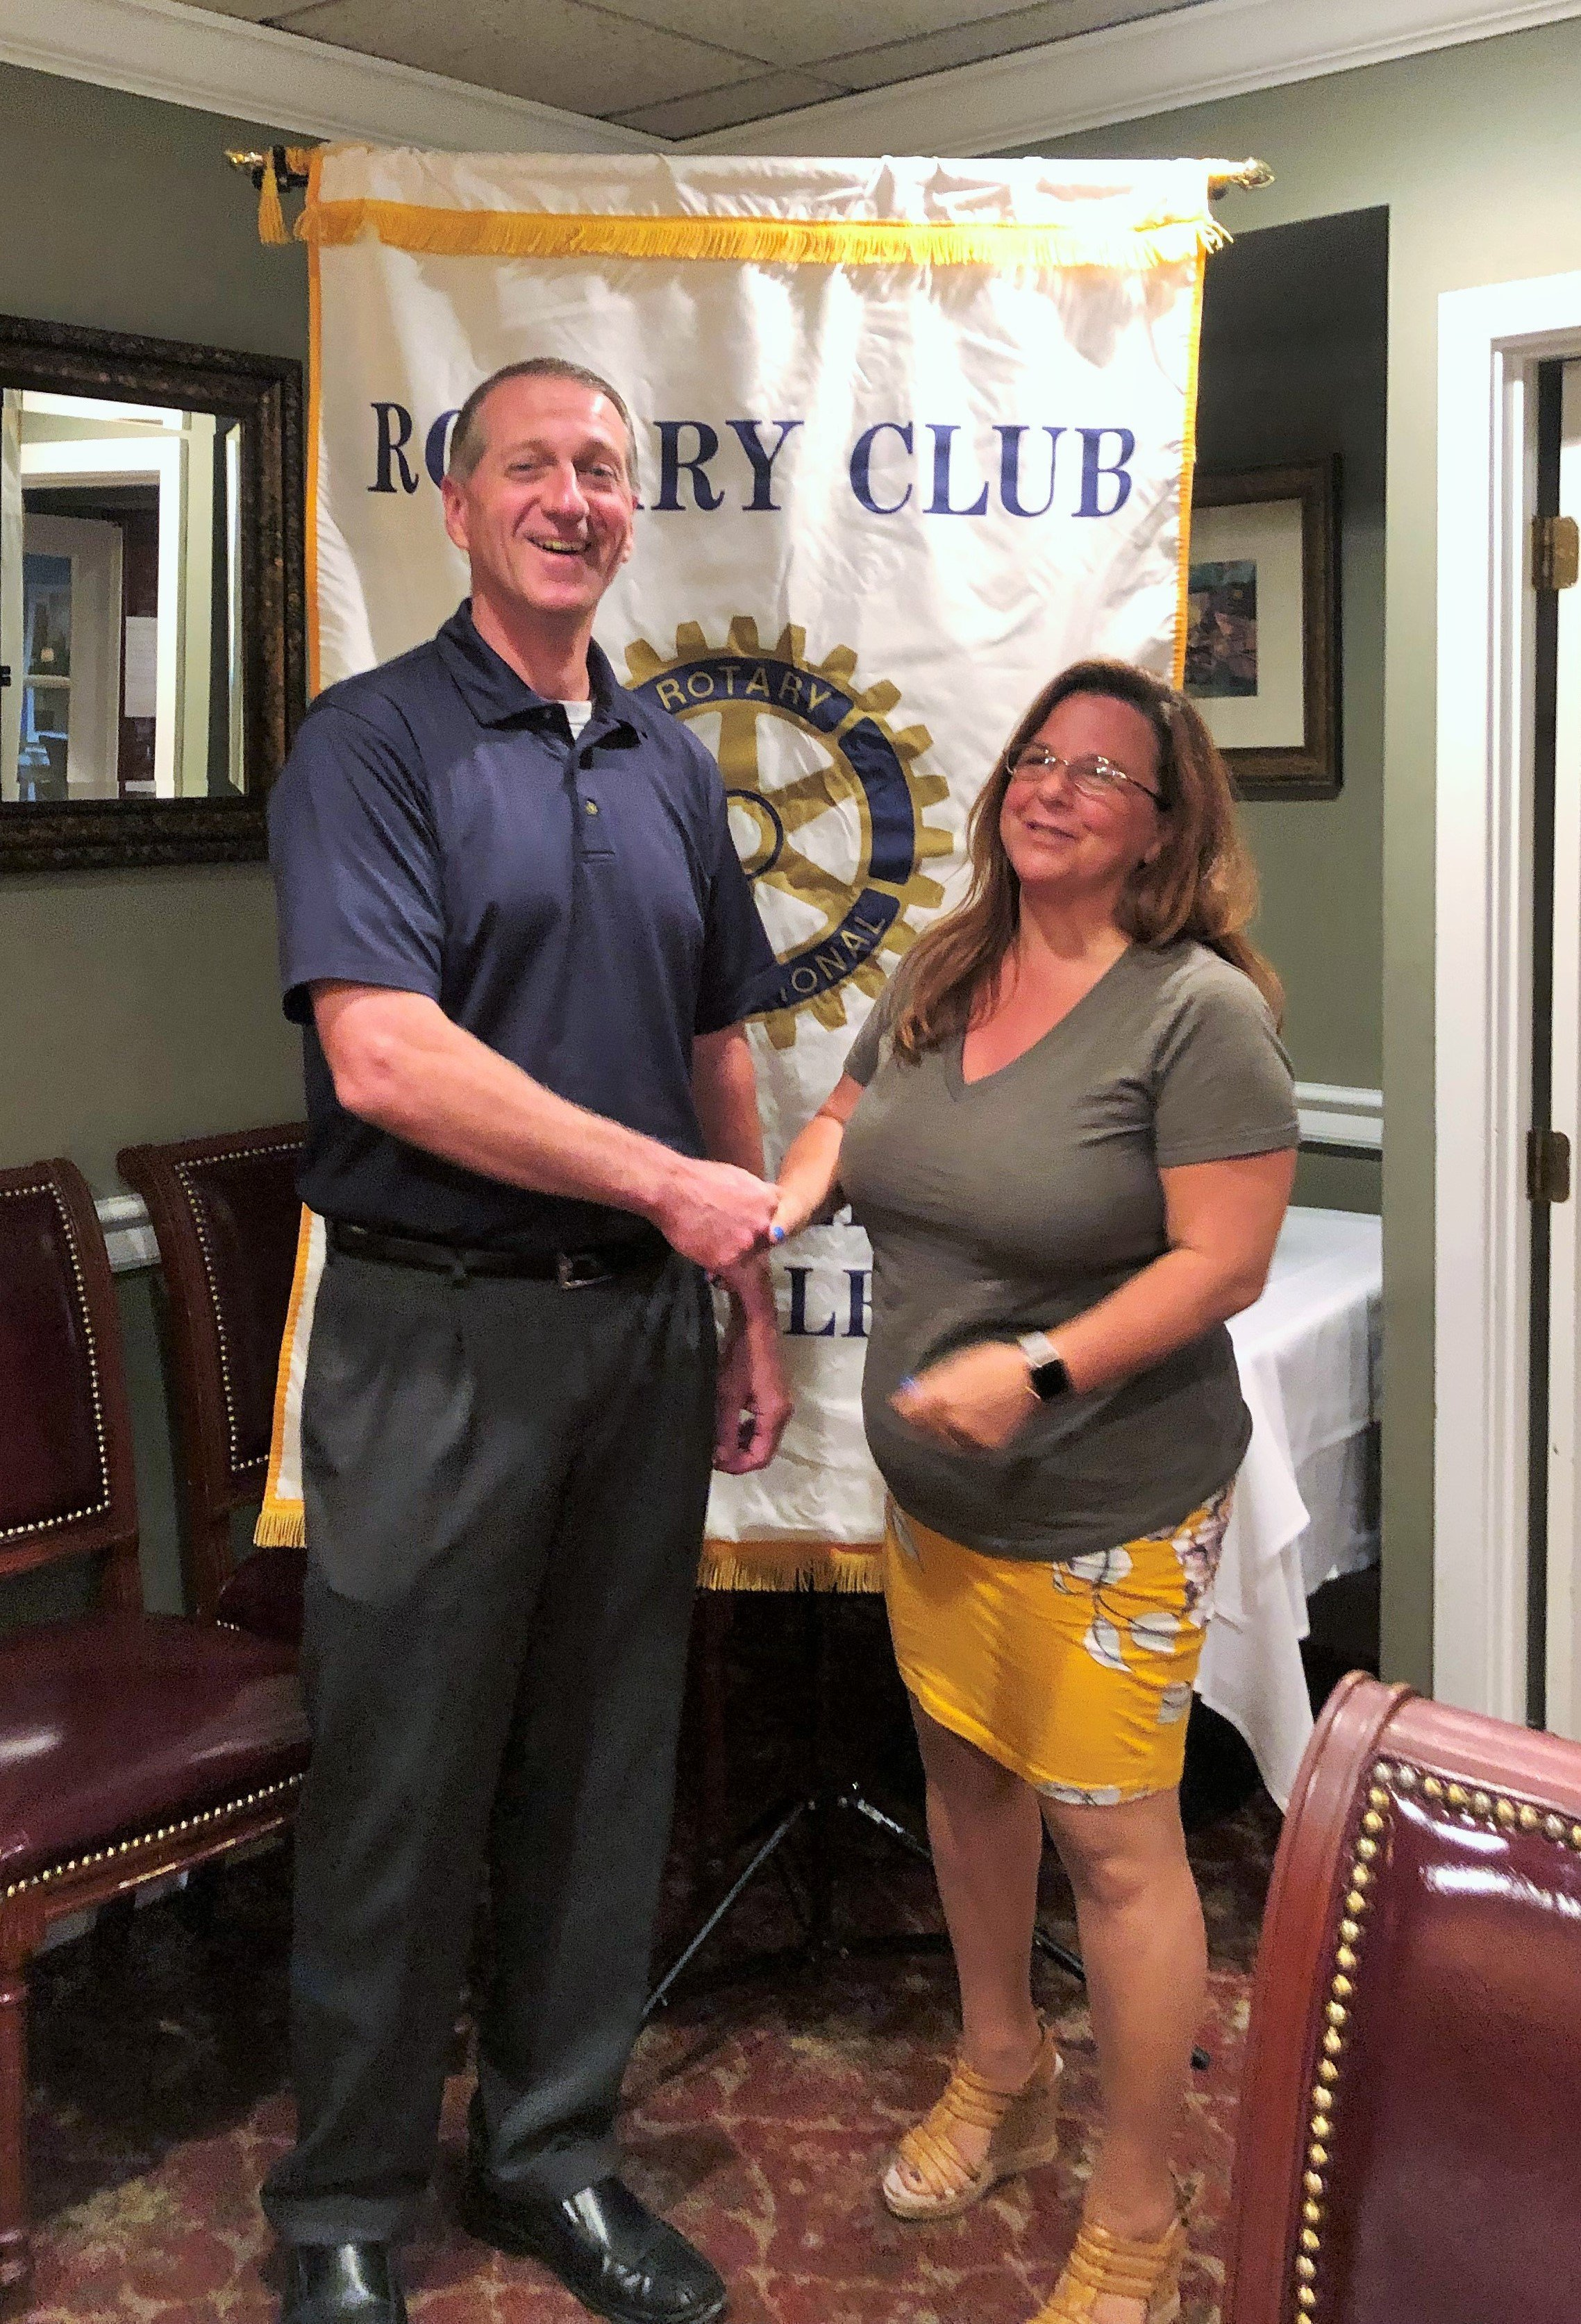 North Attleborough Rotary Club